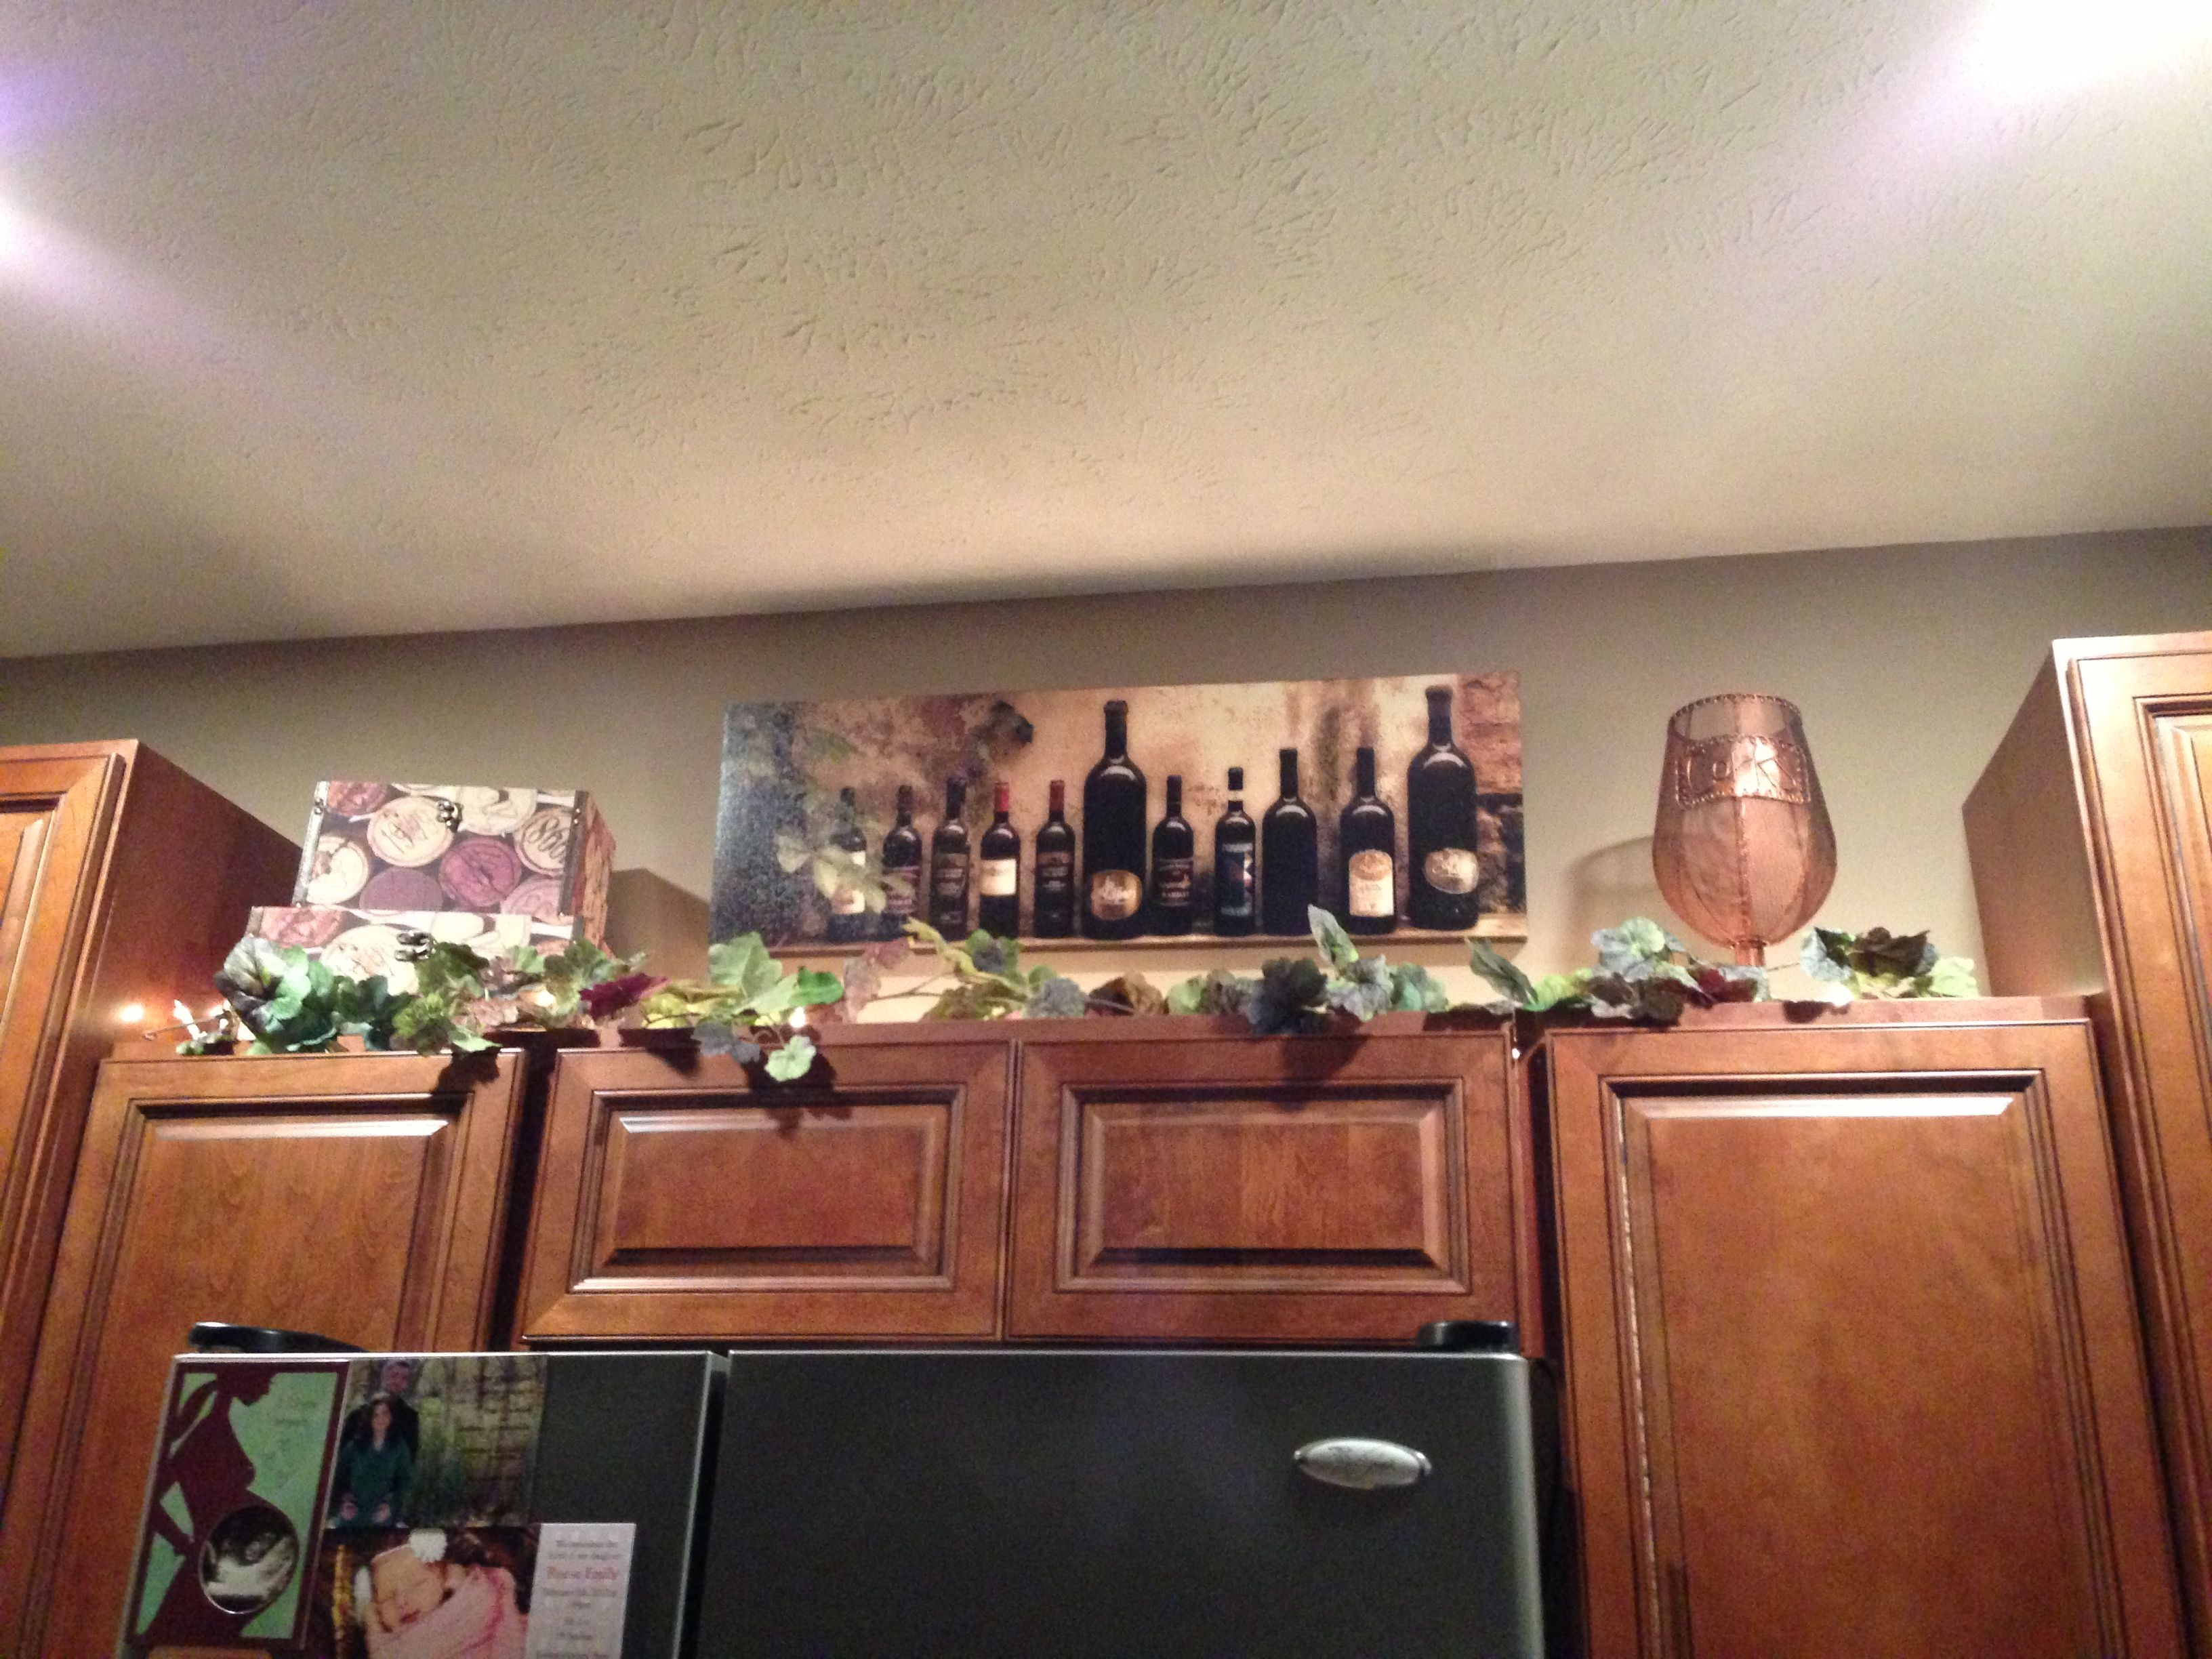 Wine kitchen cabinet decorations home decor ideas - Kitchen decor theme ideas ...